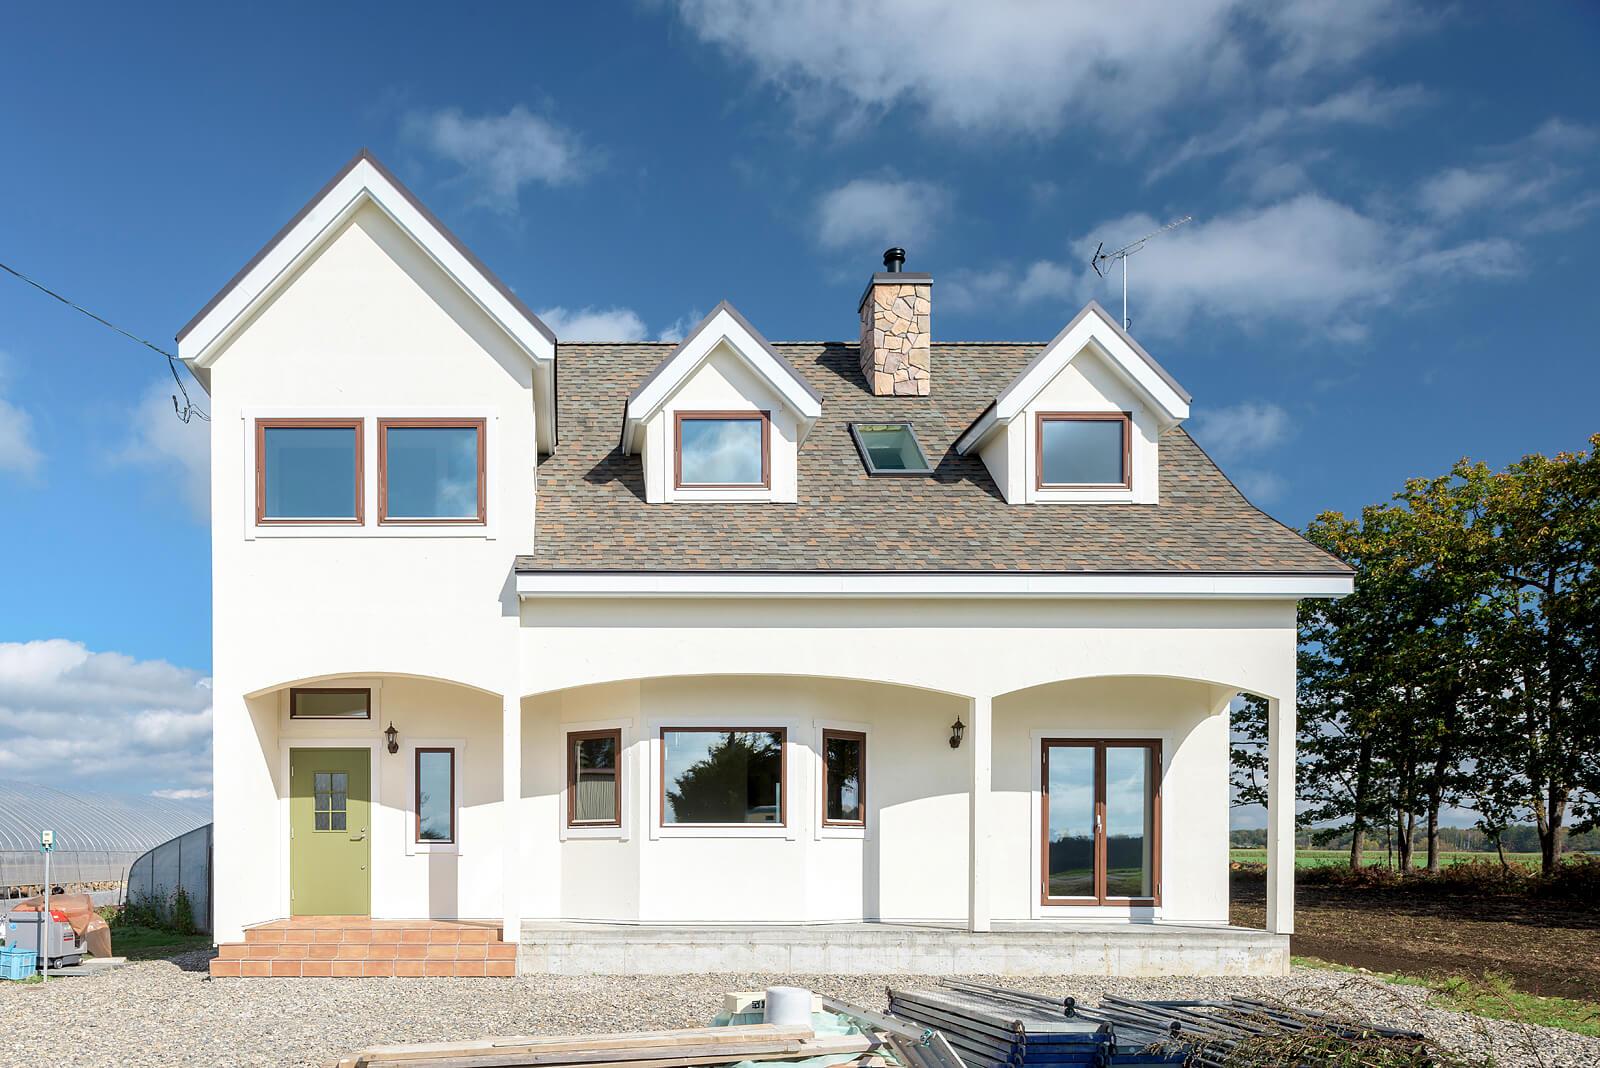 Kさん宅の外観。白い外壁に大小の三角屋根、薪ストーブの煙突が並ぶ外観は、欧州の田舎家そのもの